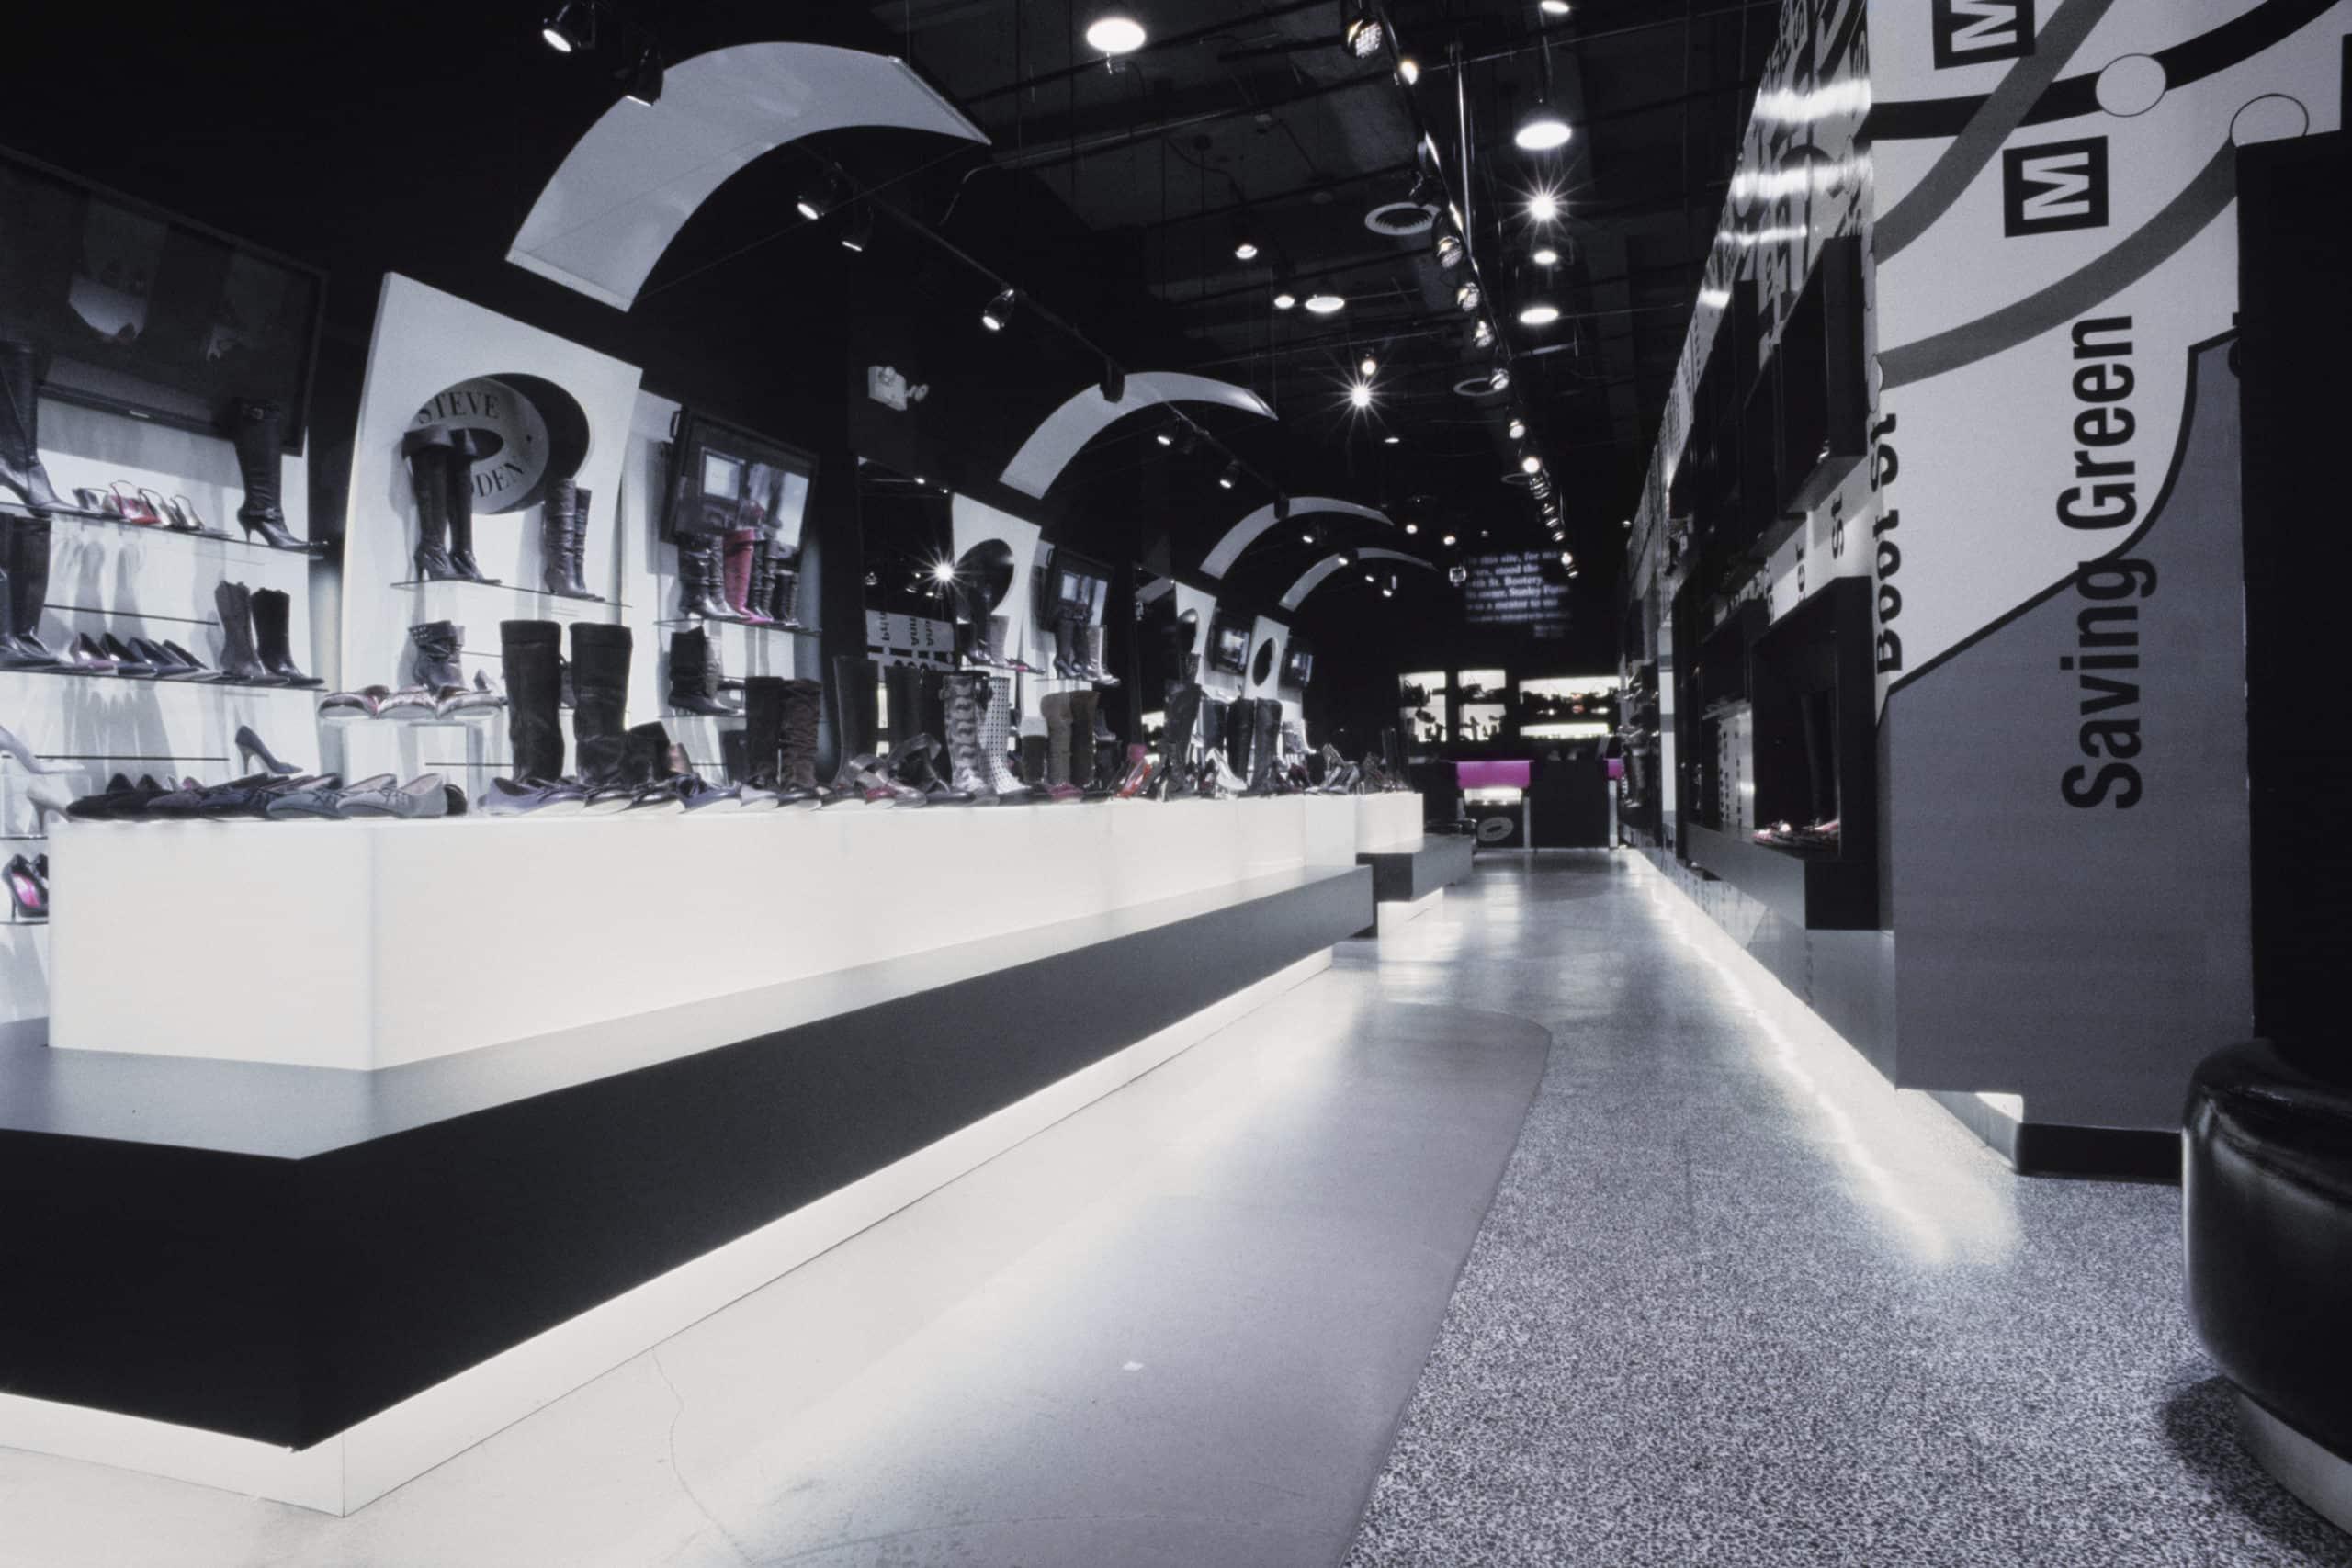 Runway effect display in Steve Madden flagship store design, New York City